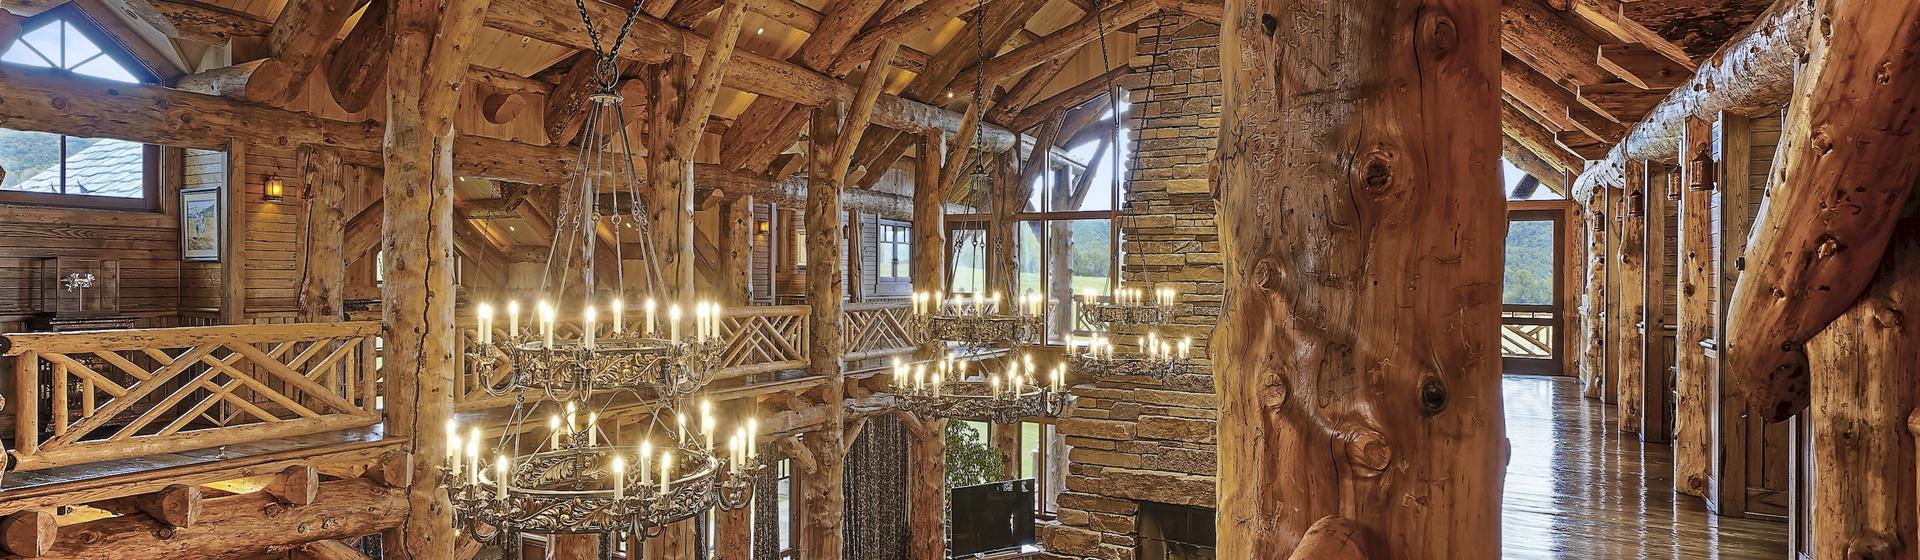 6.1-Telluride-Sleeping-Indian-Ranch-second-floor-balcony-web.JPG